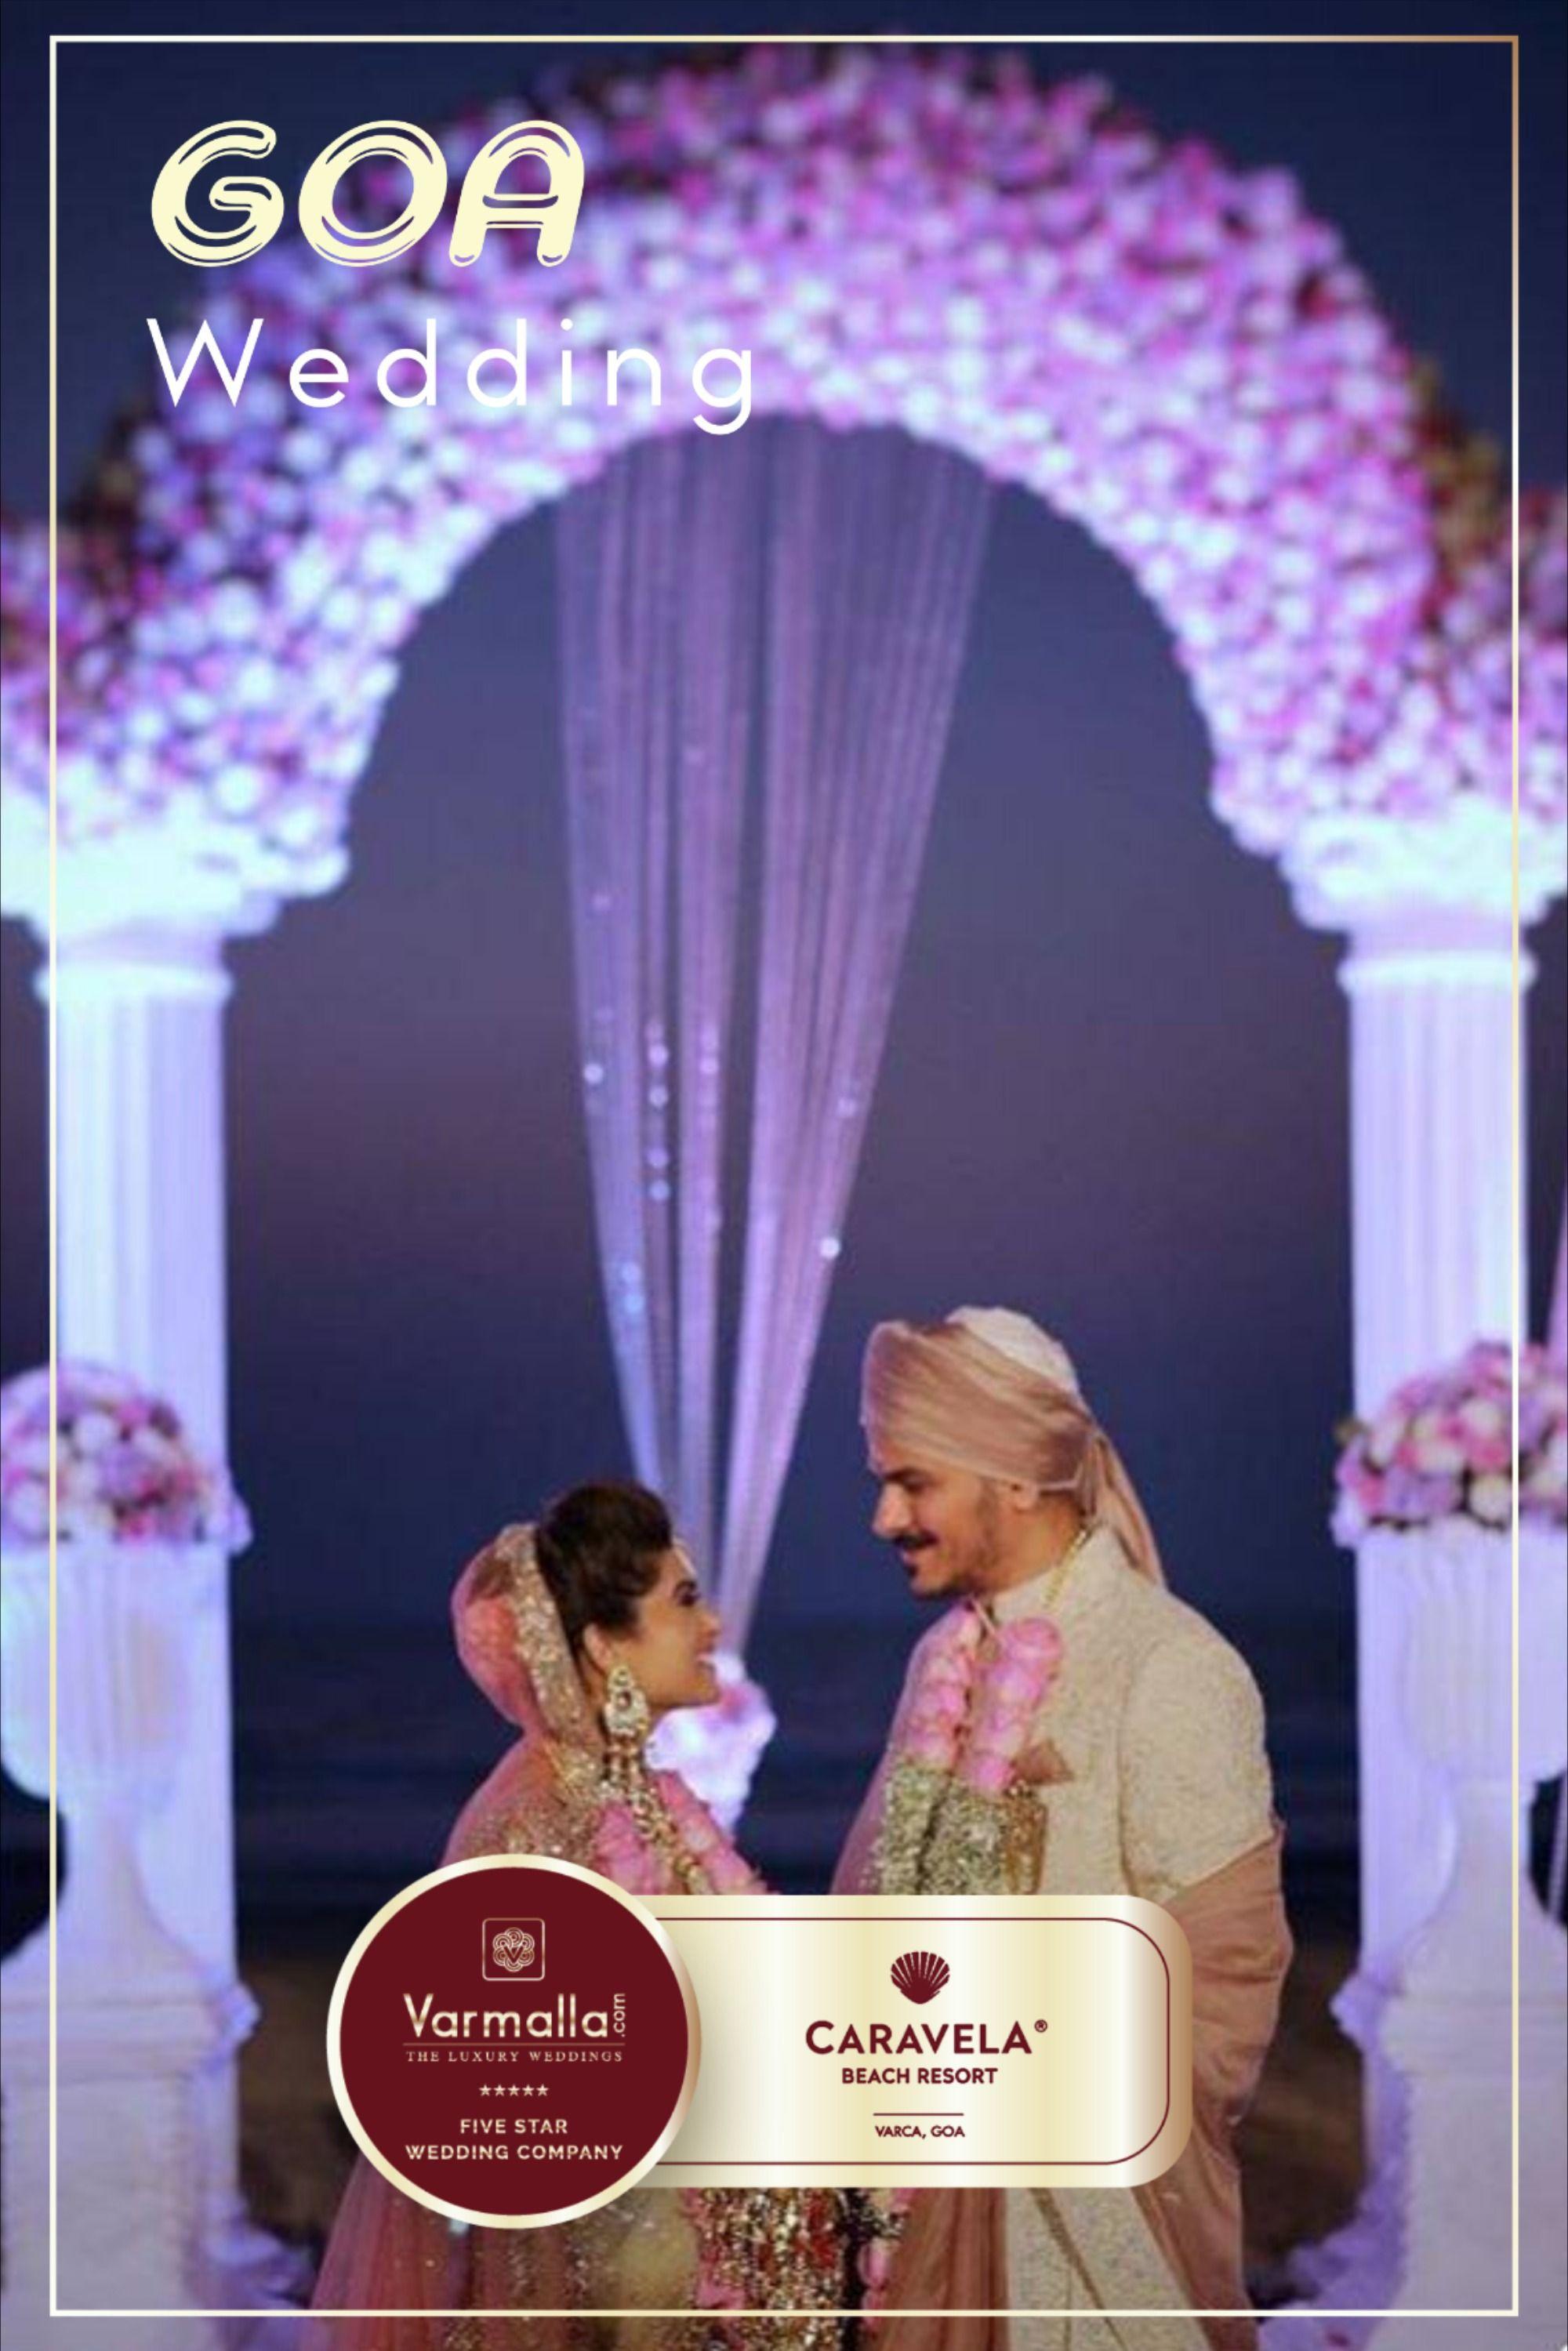 Enjoy wedding moments in this 5-star resort...#caravelabeachresort #caravelabeachresortgoa #ramadacaravelabeachresort #ramada #ramadainn  #ramadahotel #tajmahal #tajpalace #goa #goaindia #goataco #weddinginvitationcards #honeymoon #honeymoonpackages #bridallehenga #bridalmakeup #bridalmehndidesign #bridalmehndi #Bridalsaree #bridaljewellery #bride #indianbride #bridegroom #eventmanagement #weddingplanner #weddinginvitationcards #destination #destinationwedding #weddingdecorations#weddinggift